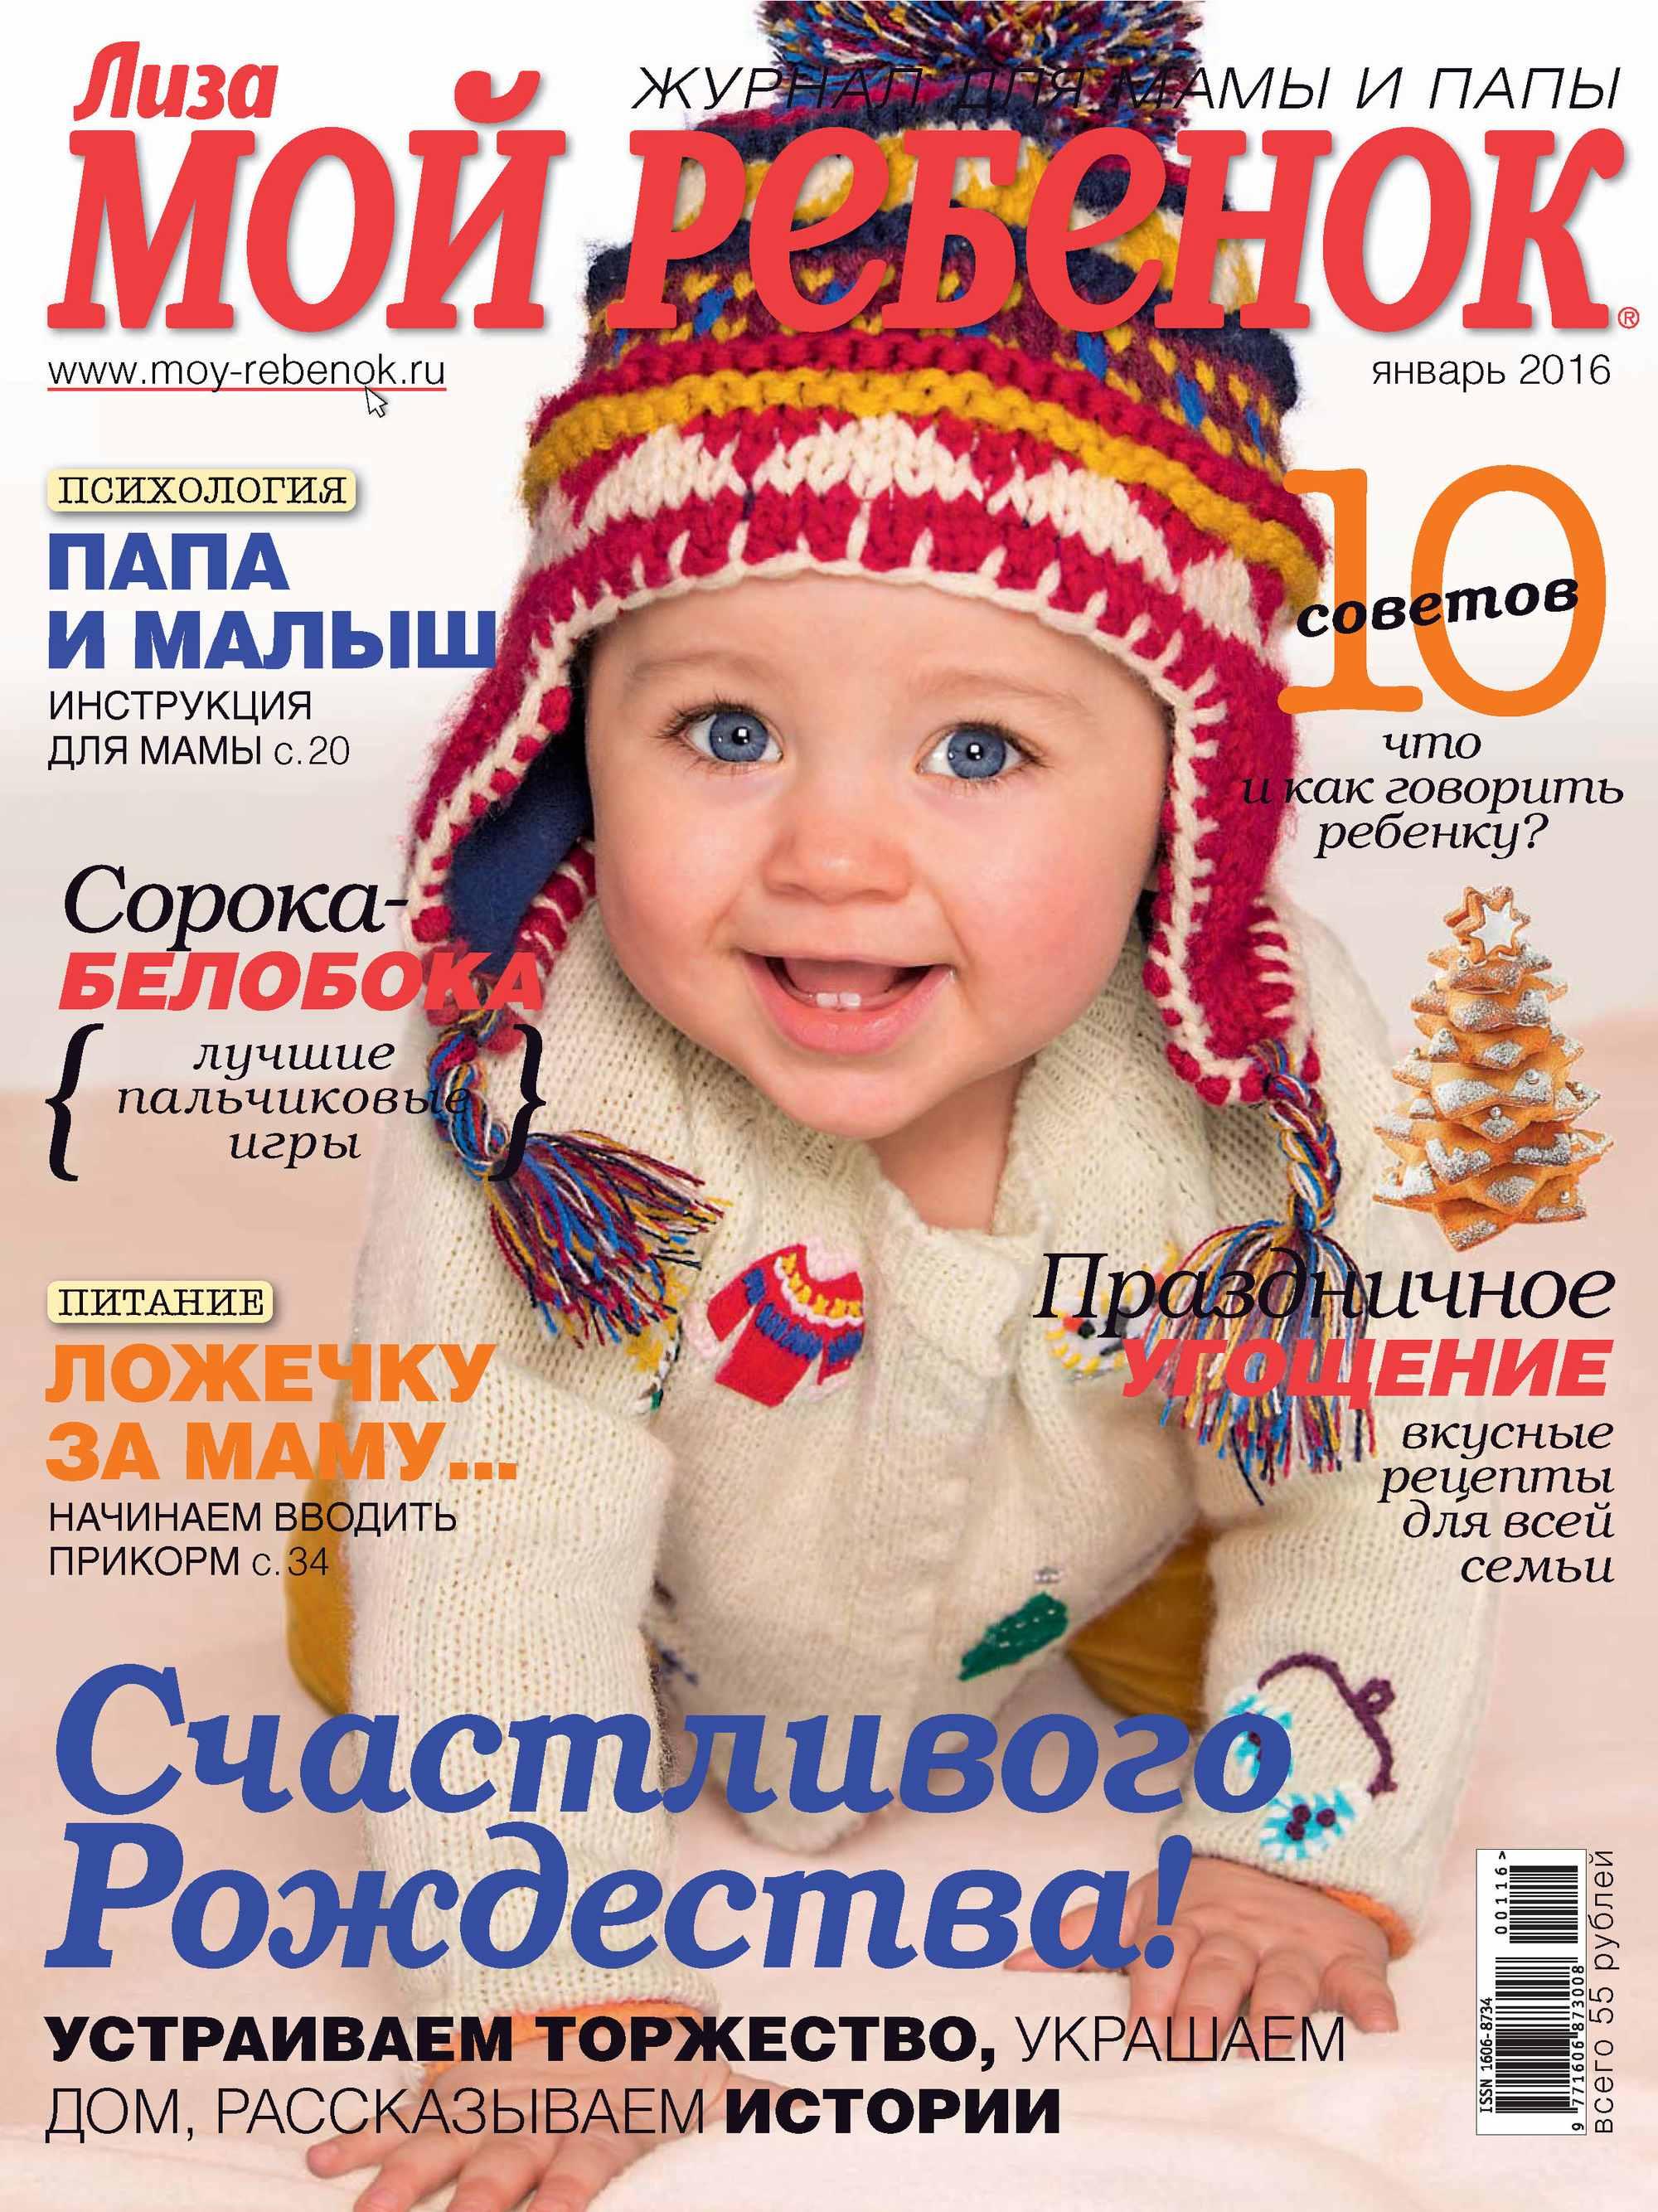 ИД «Бурда» Журнал «Лиза. Мой ребенок» №01/2016 ид бурда журнал лиза мой ребенок 09 2016